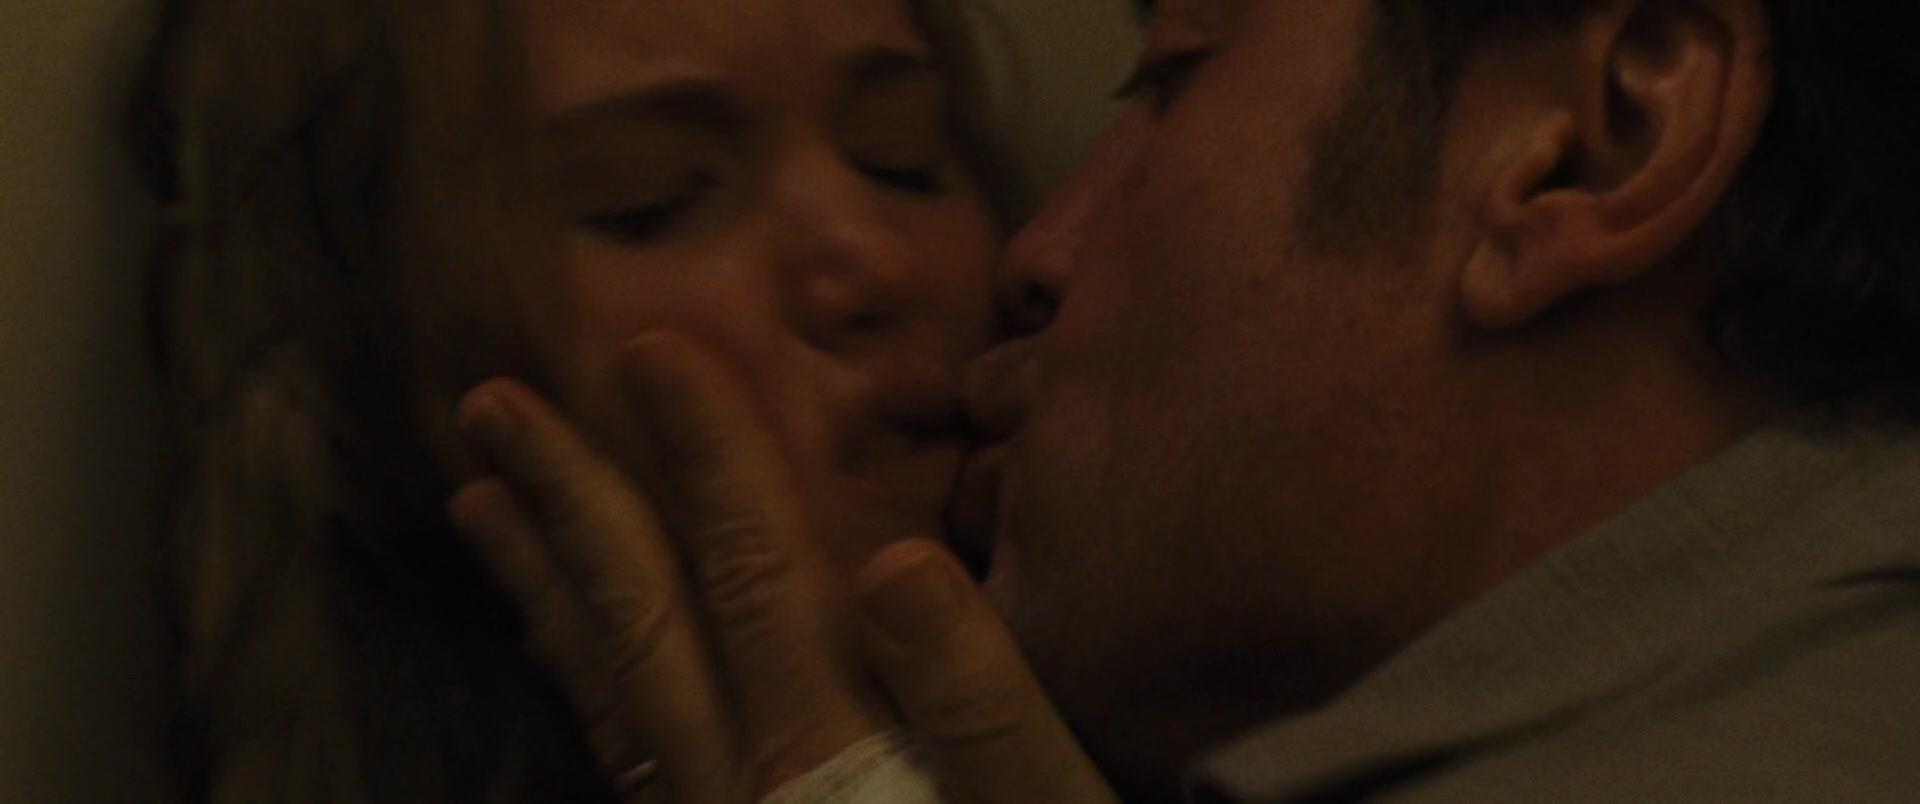 Jennifer-Lawrence-Michelle-Pfeiffer-Mother-26-thefappeningblog.com_.jpg